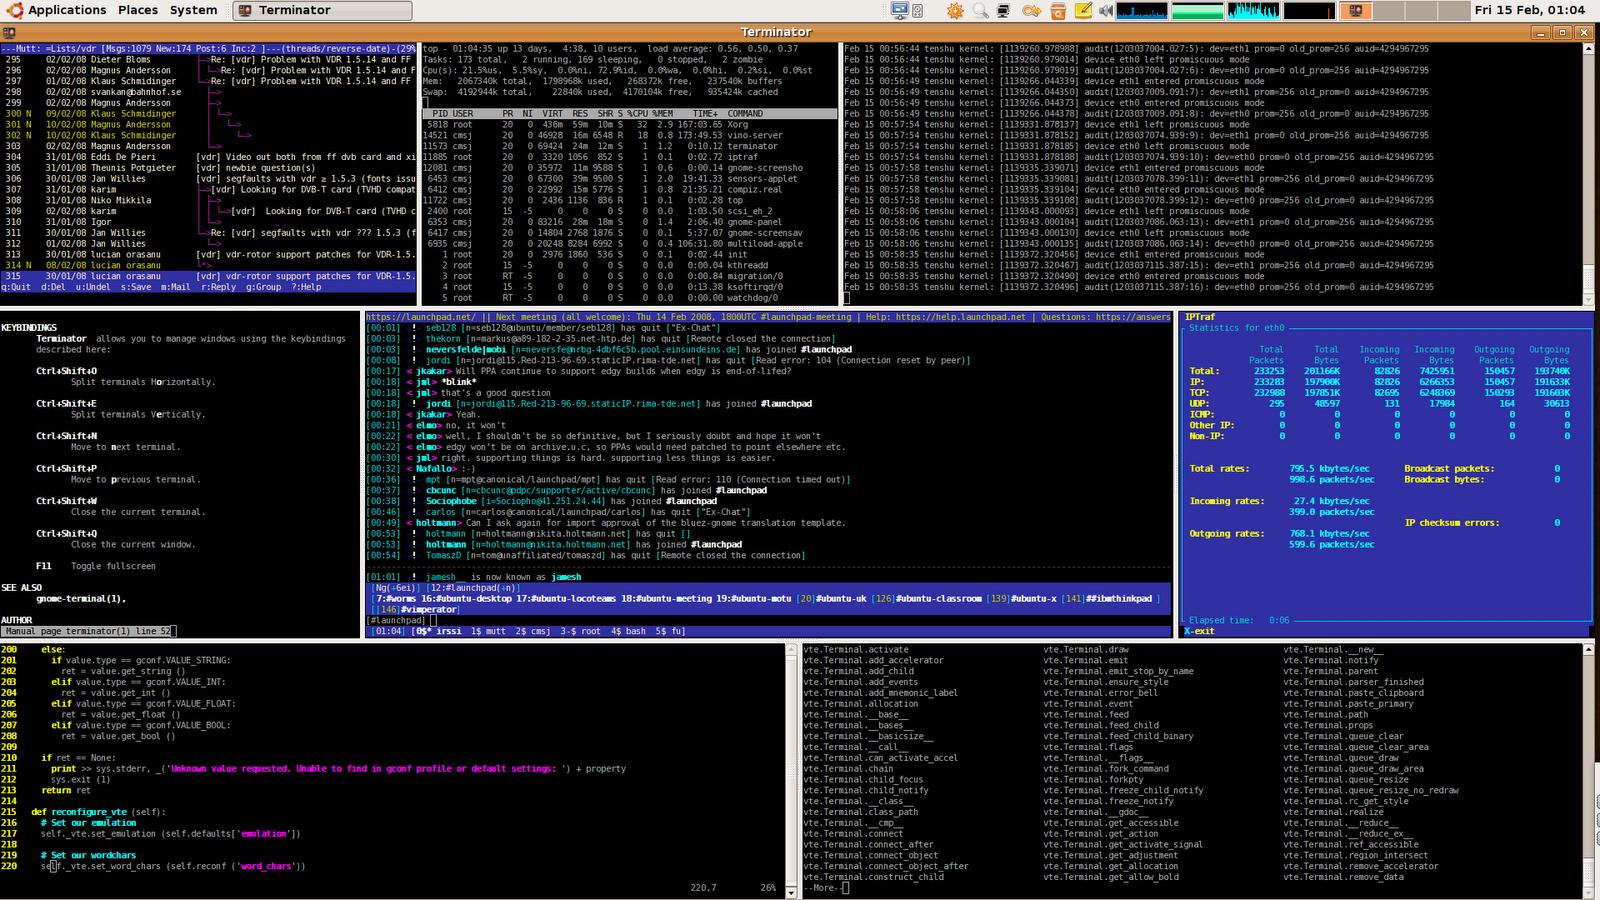 The Terminator terminal UI